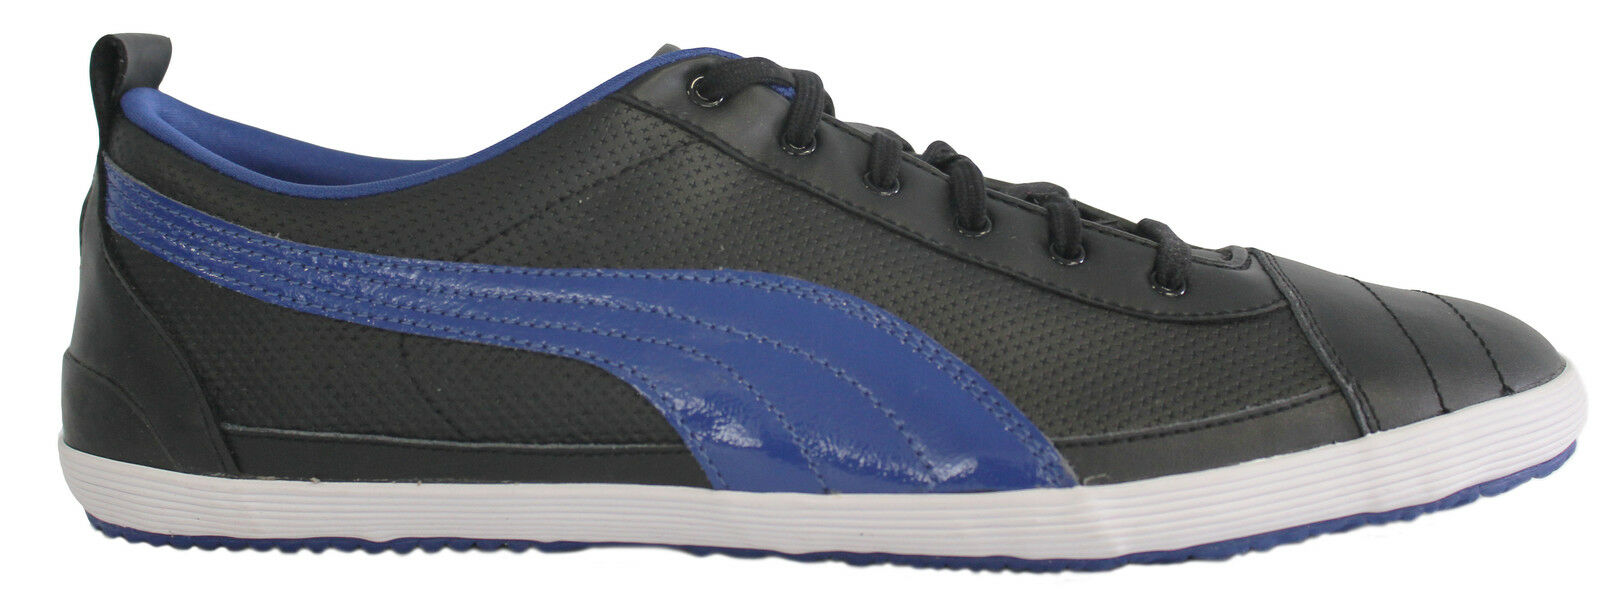 Puma l servir pro l / l Puma hombre chico cordones zapatillas negras 354910 11 U10 barato y hermoso moda ada942